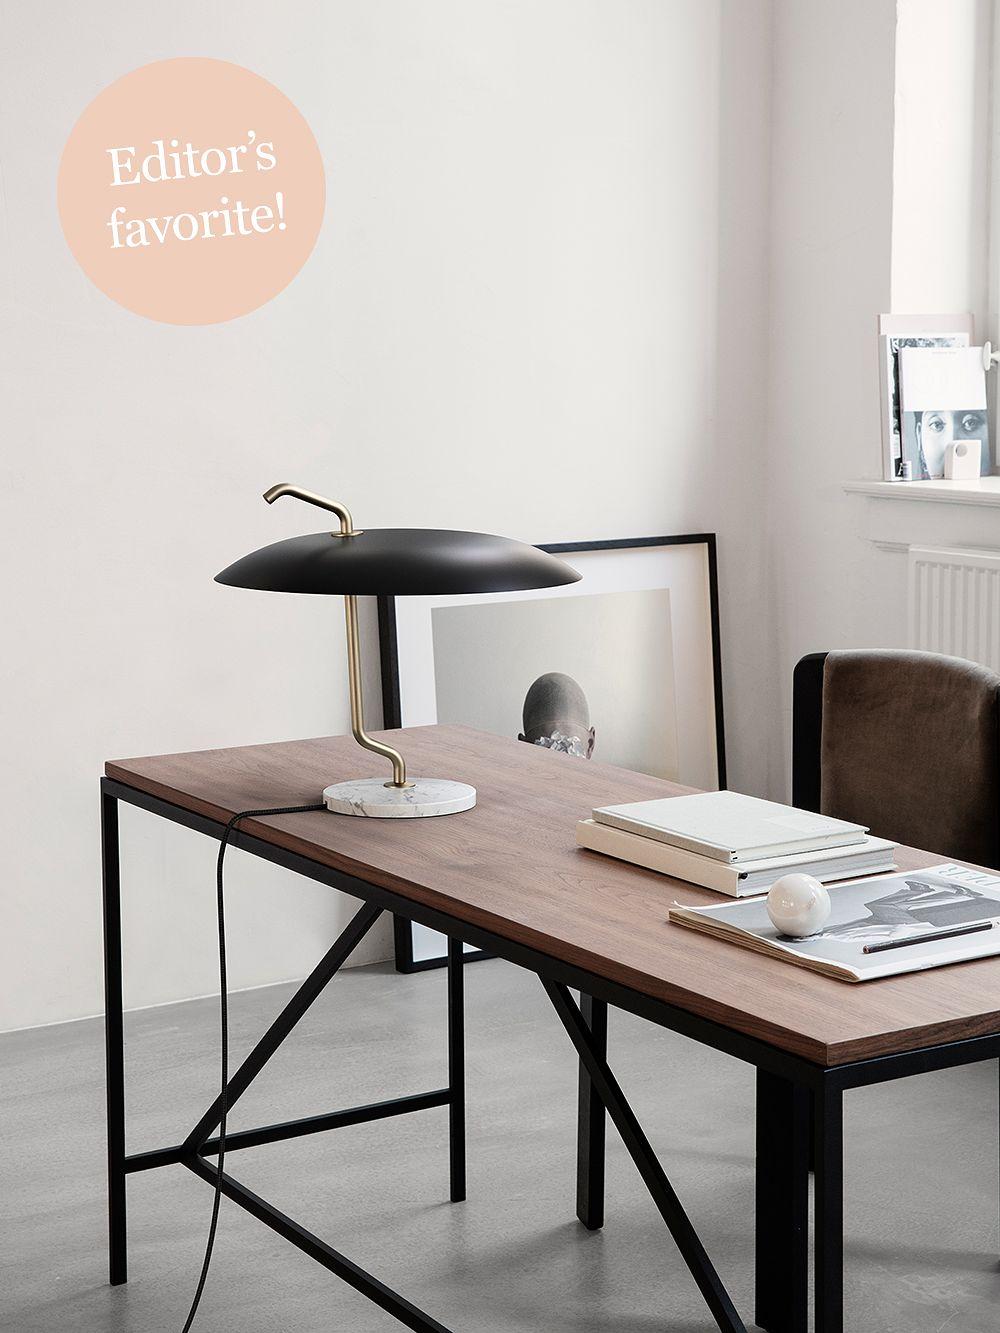 Astep Model 537 table lamp